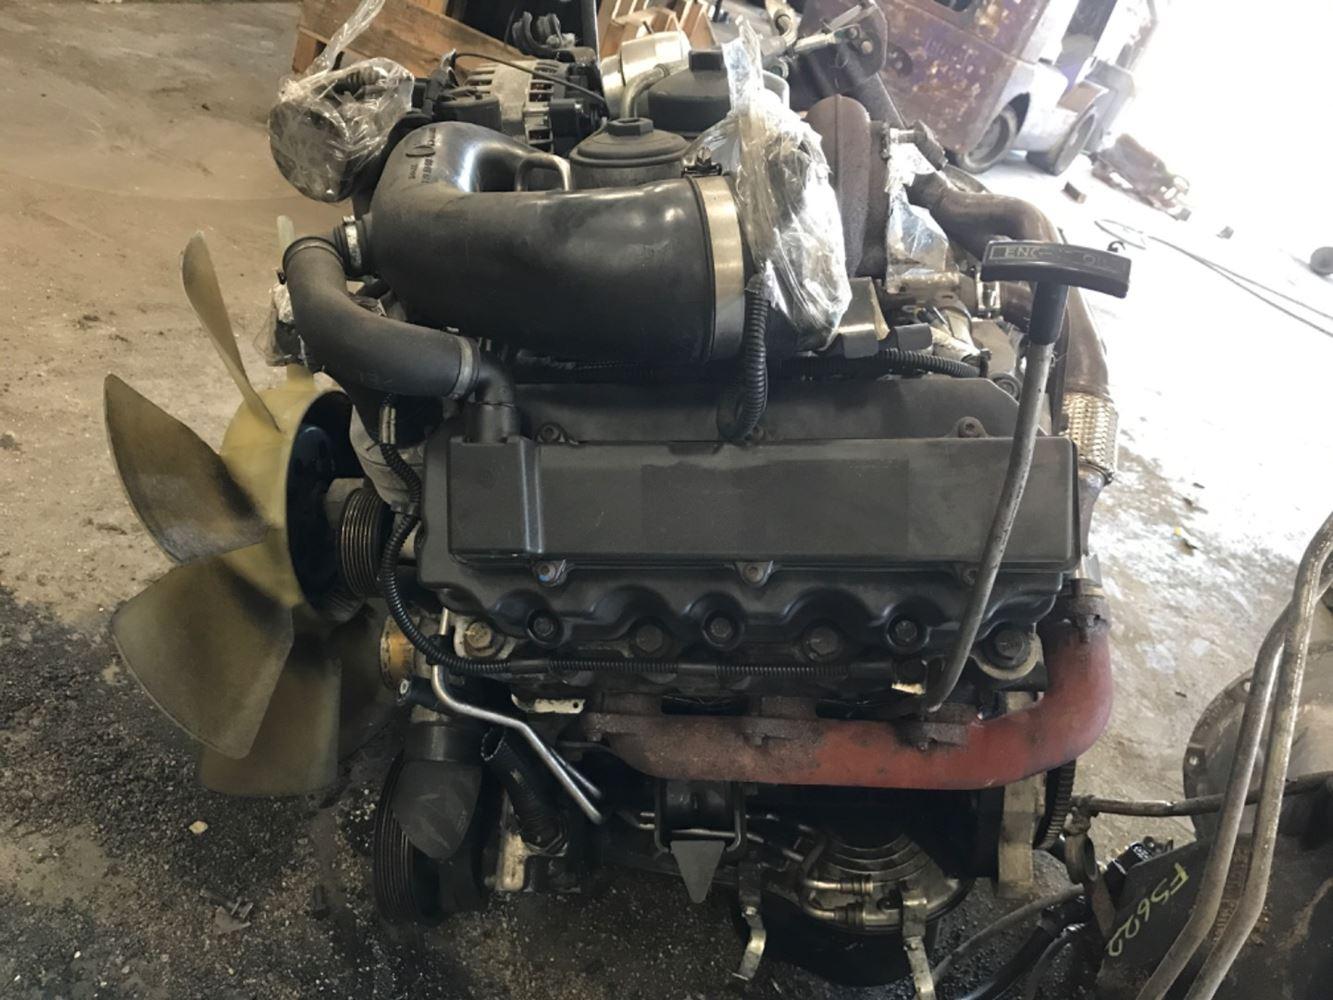 2006 INTERNATIONAL 4.5L ENGINE ASSEMBLY TRUCK PARTS #709785